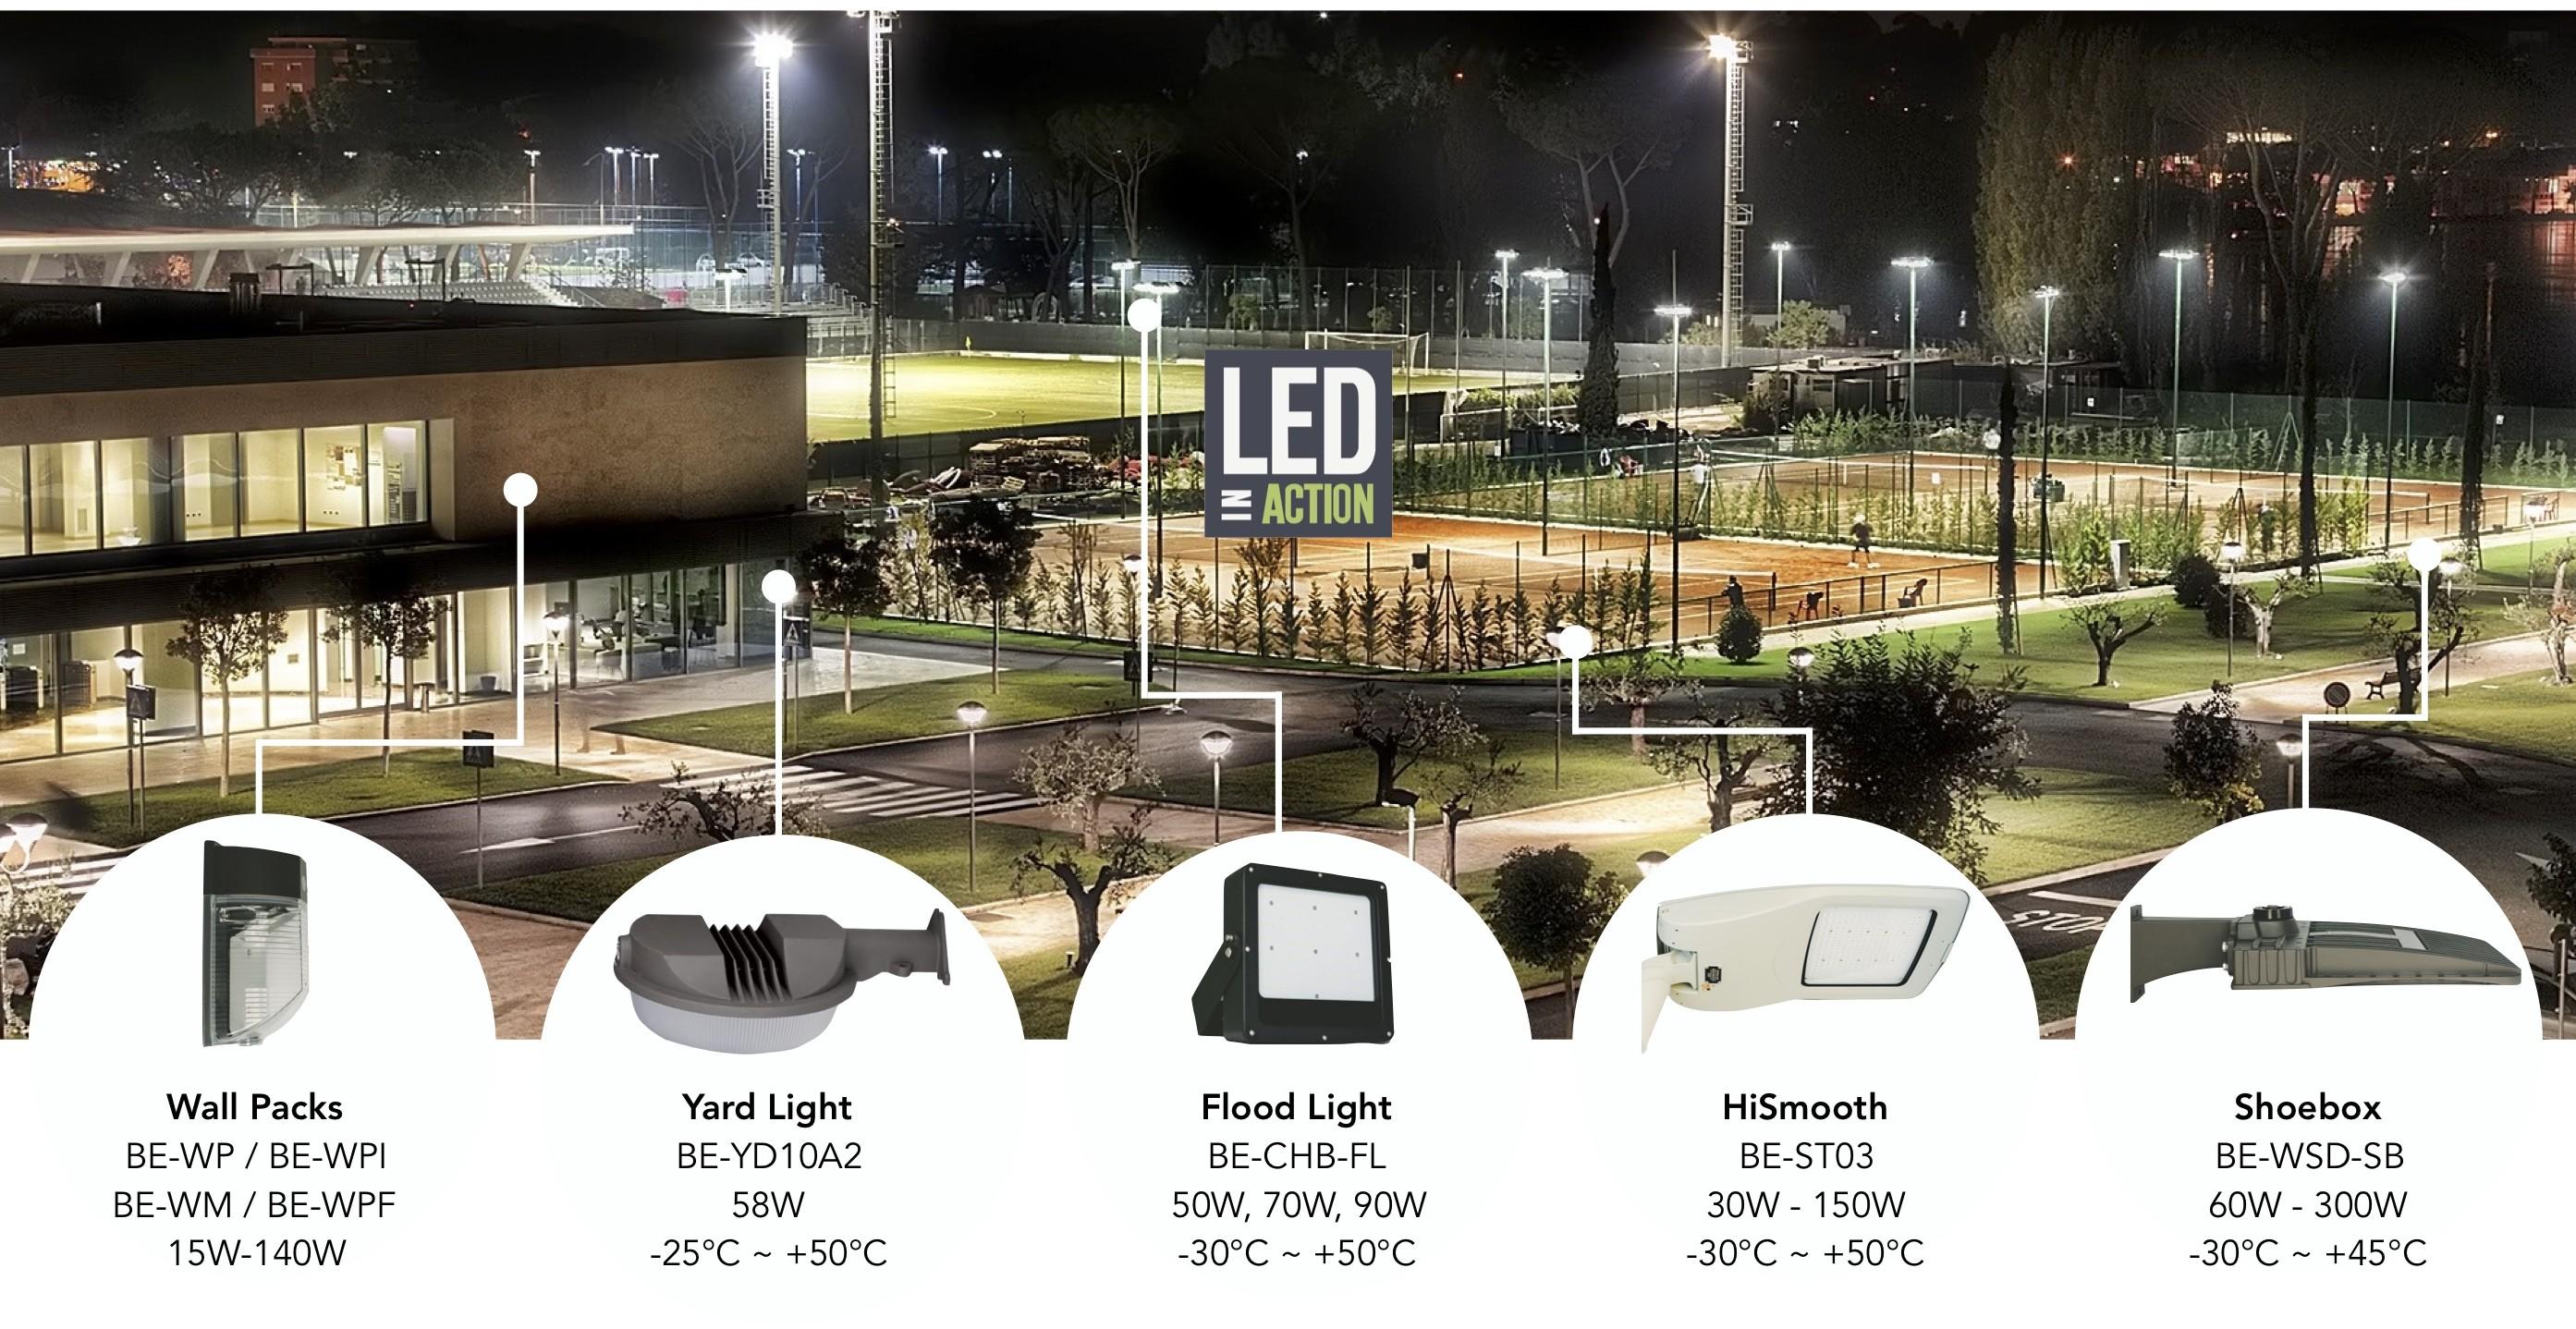 5 Outdoor Led Lights For Dark Winter Months Ledinaction